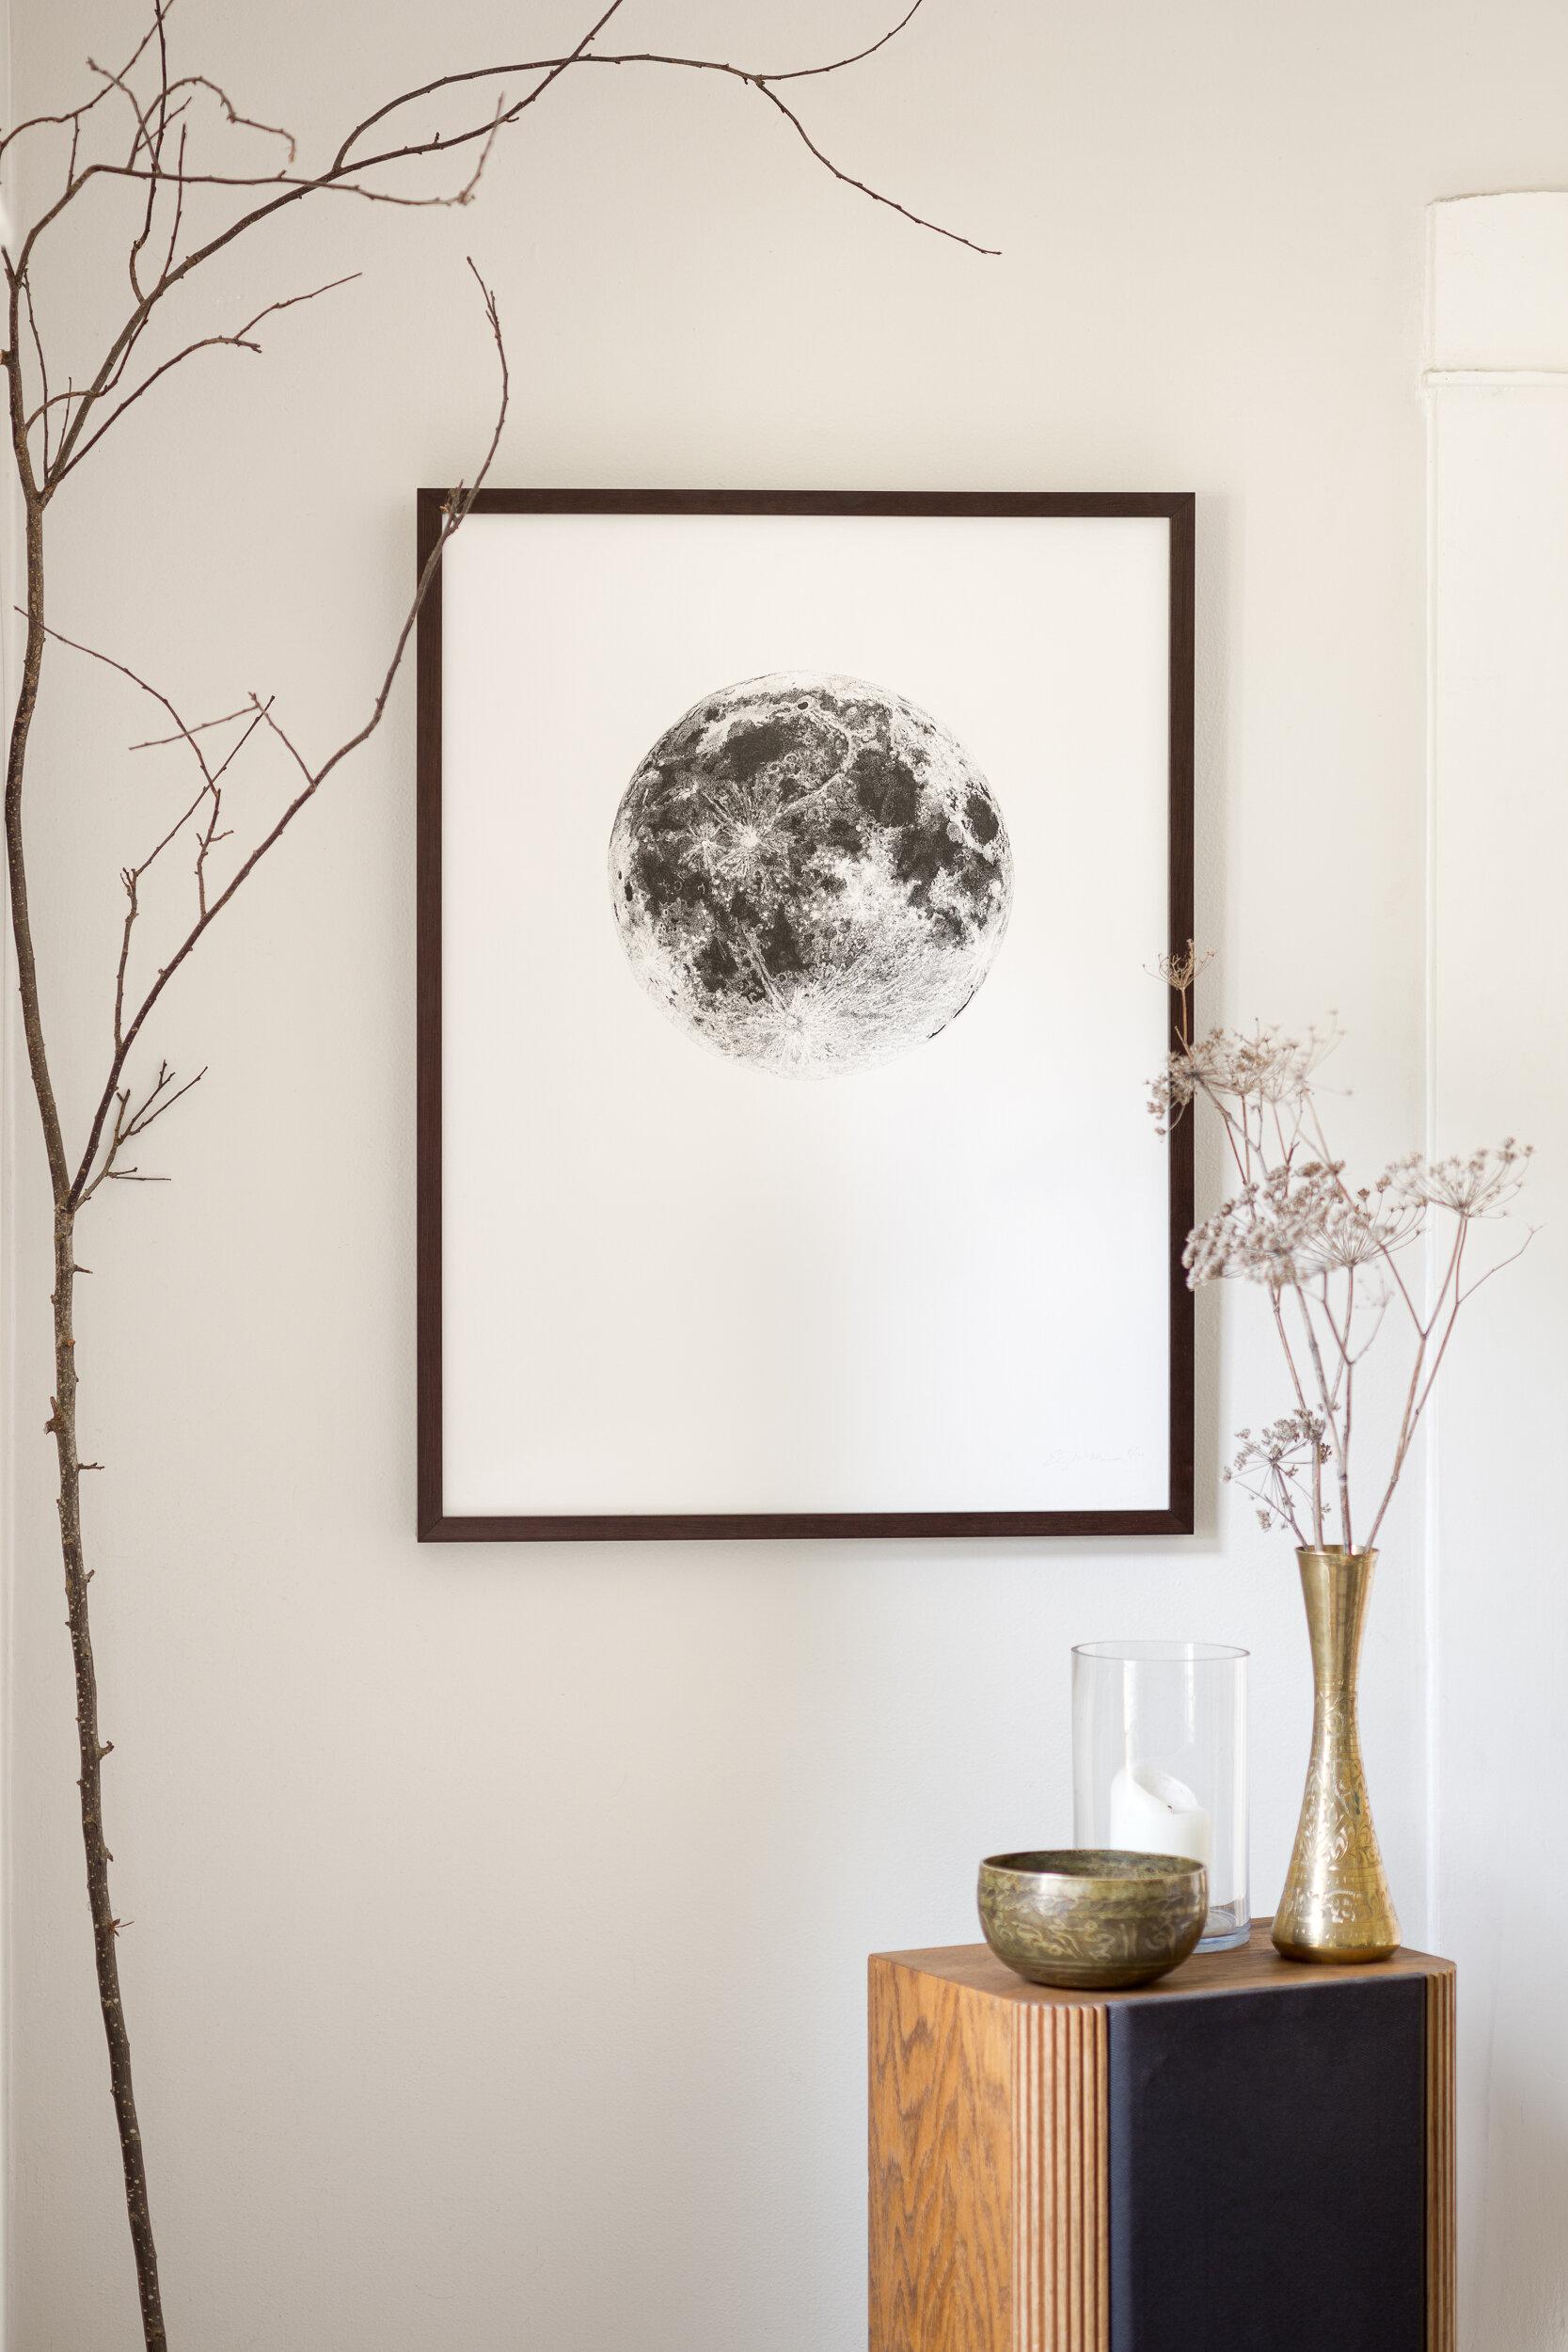 01-LM-Moons-JoshPartee-3386.jpg